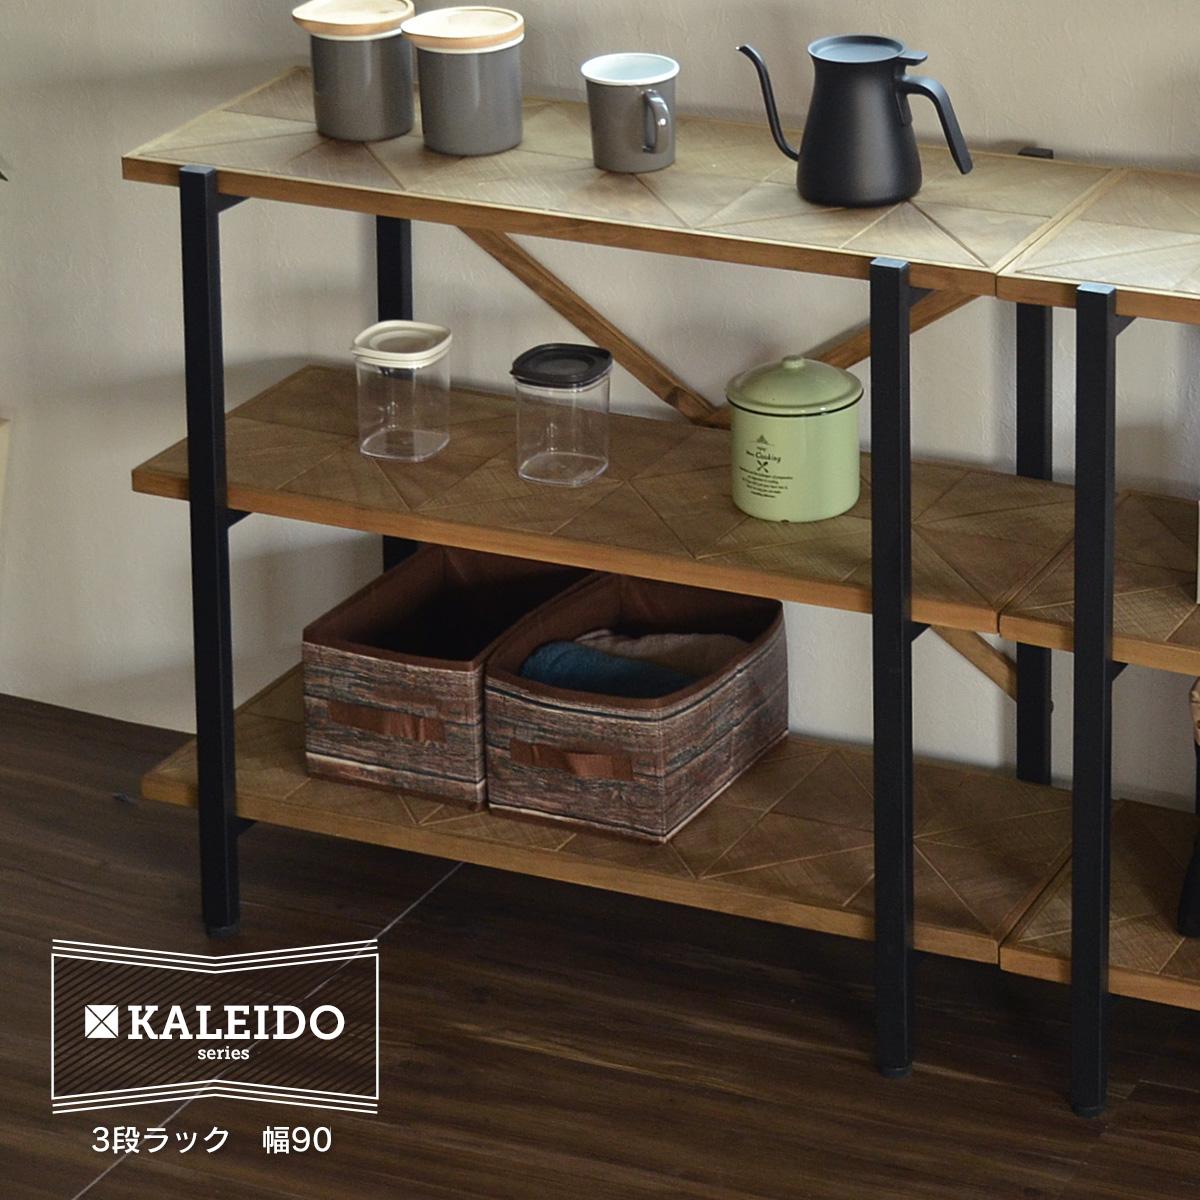 KALEIDO カレイド 3段ラック 幅90 オープン 収納 木製 棚 本棚 シェルフ 間仕切り ディスプレイ コンパクト スリム 省スペース 一人暮らし リビング おしゃれ デザインビンテージ